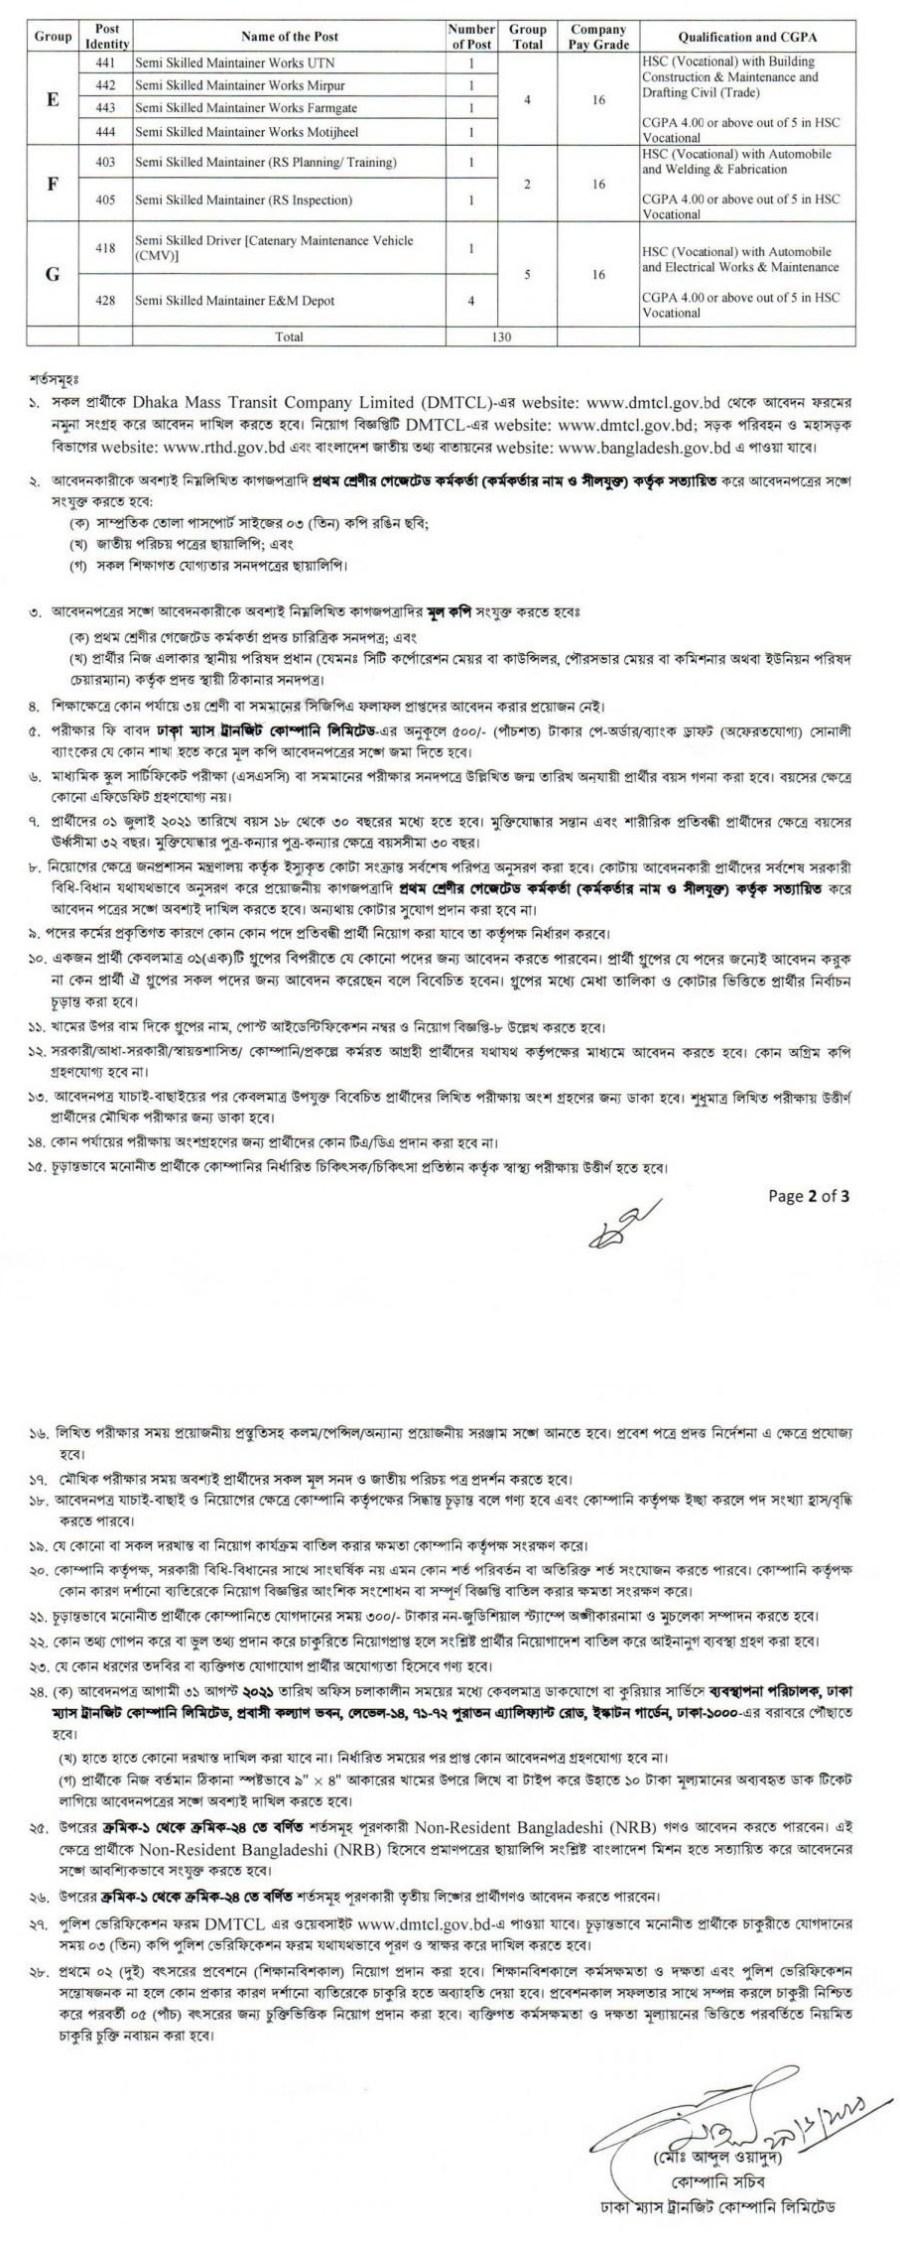 Dhaka Mass Transit Company Limited Job Circular 31 Augast 2021